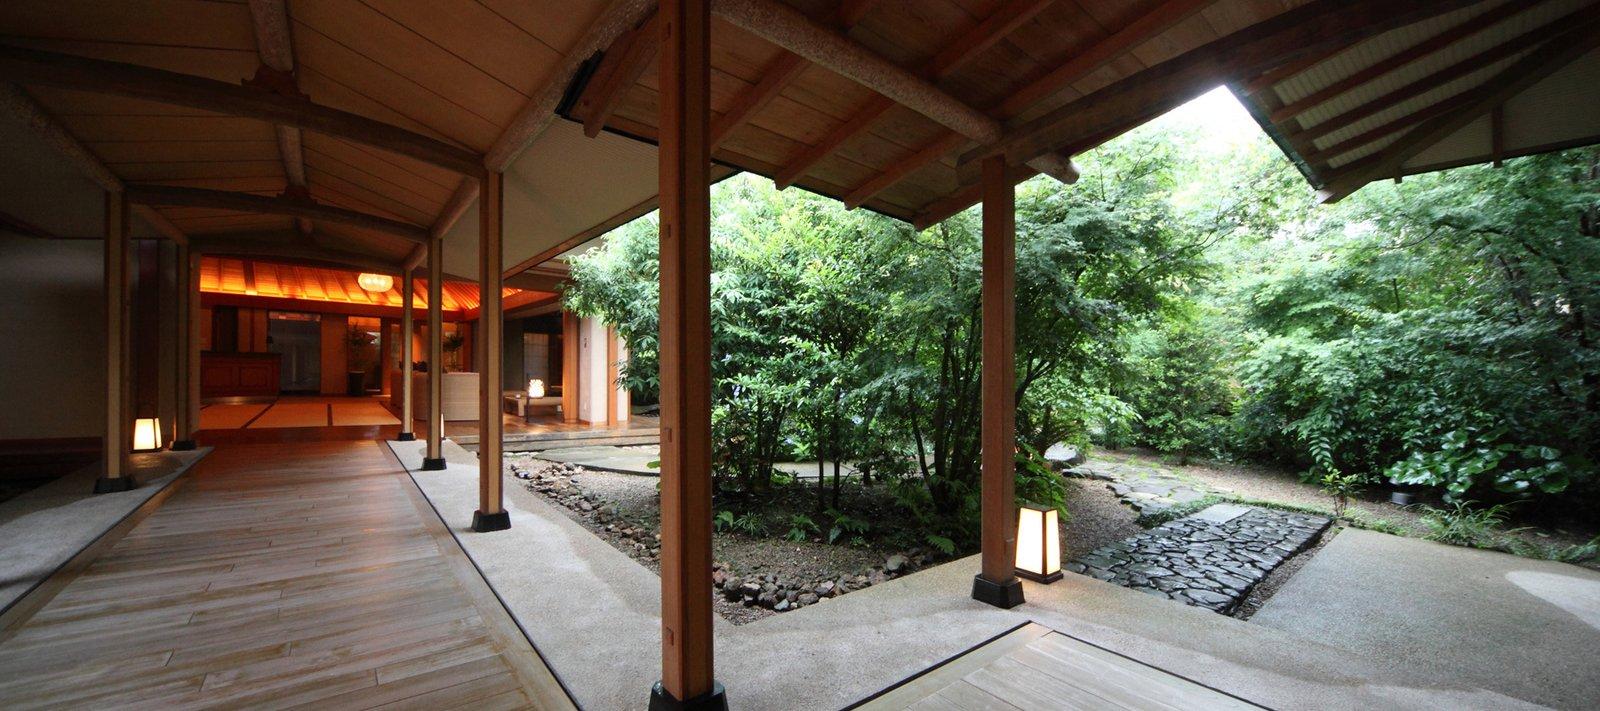 Outdoor, Trees, Concrete Patio, Porch, Deck, and Wood Patio, Porch, Deck  Bettei Otozure